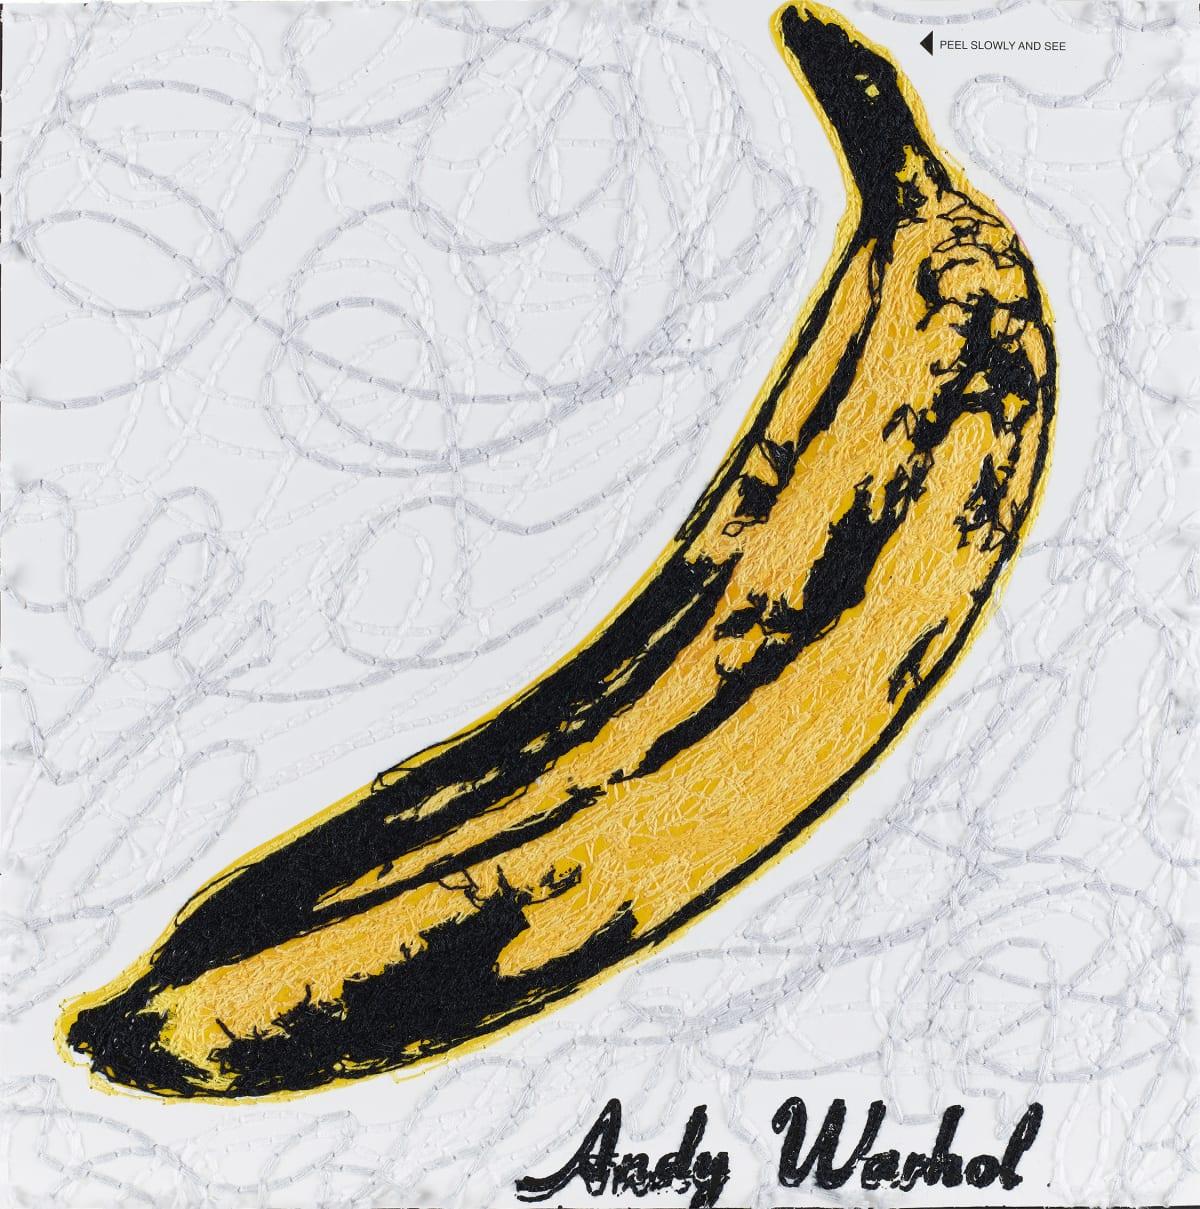 Stephen Wilson, The Velvet Underground & Nico, The Velvet Underground , 2019